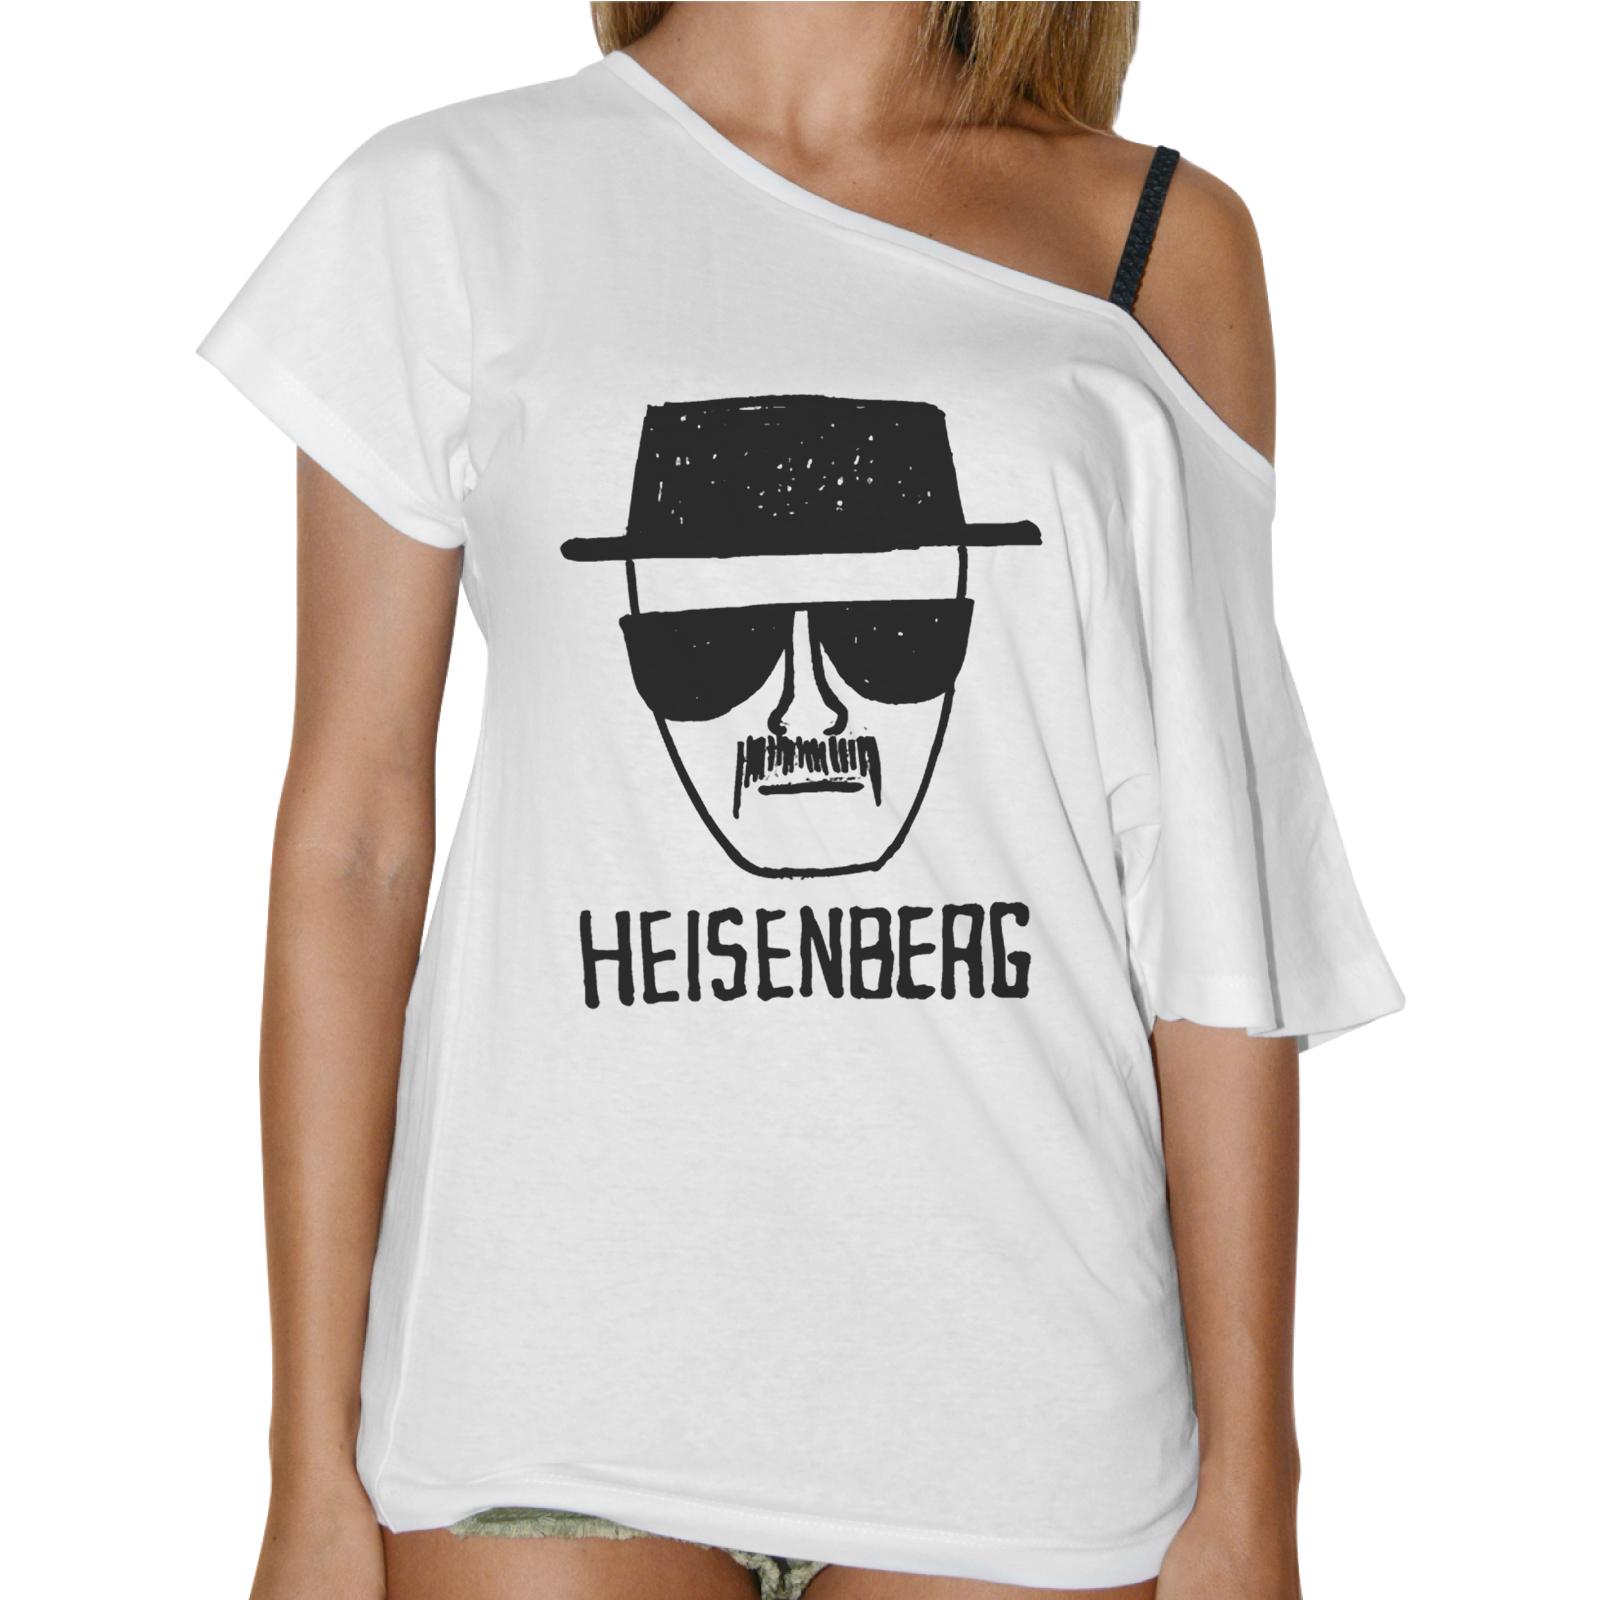 T-Shirt Donna Collo Barca HEISENBERG